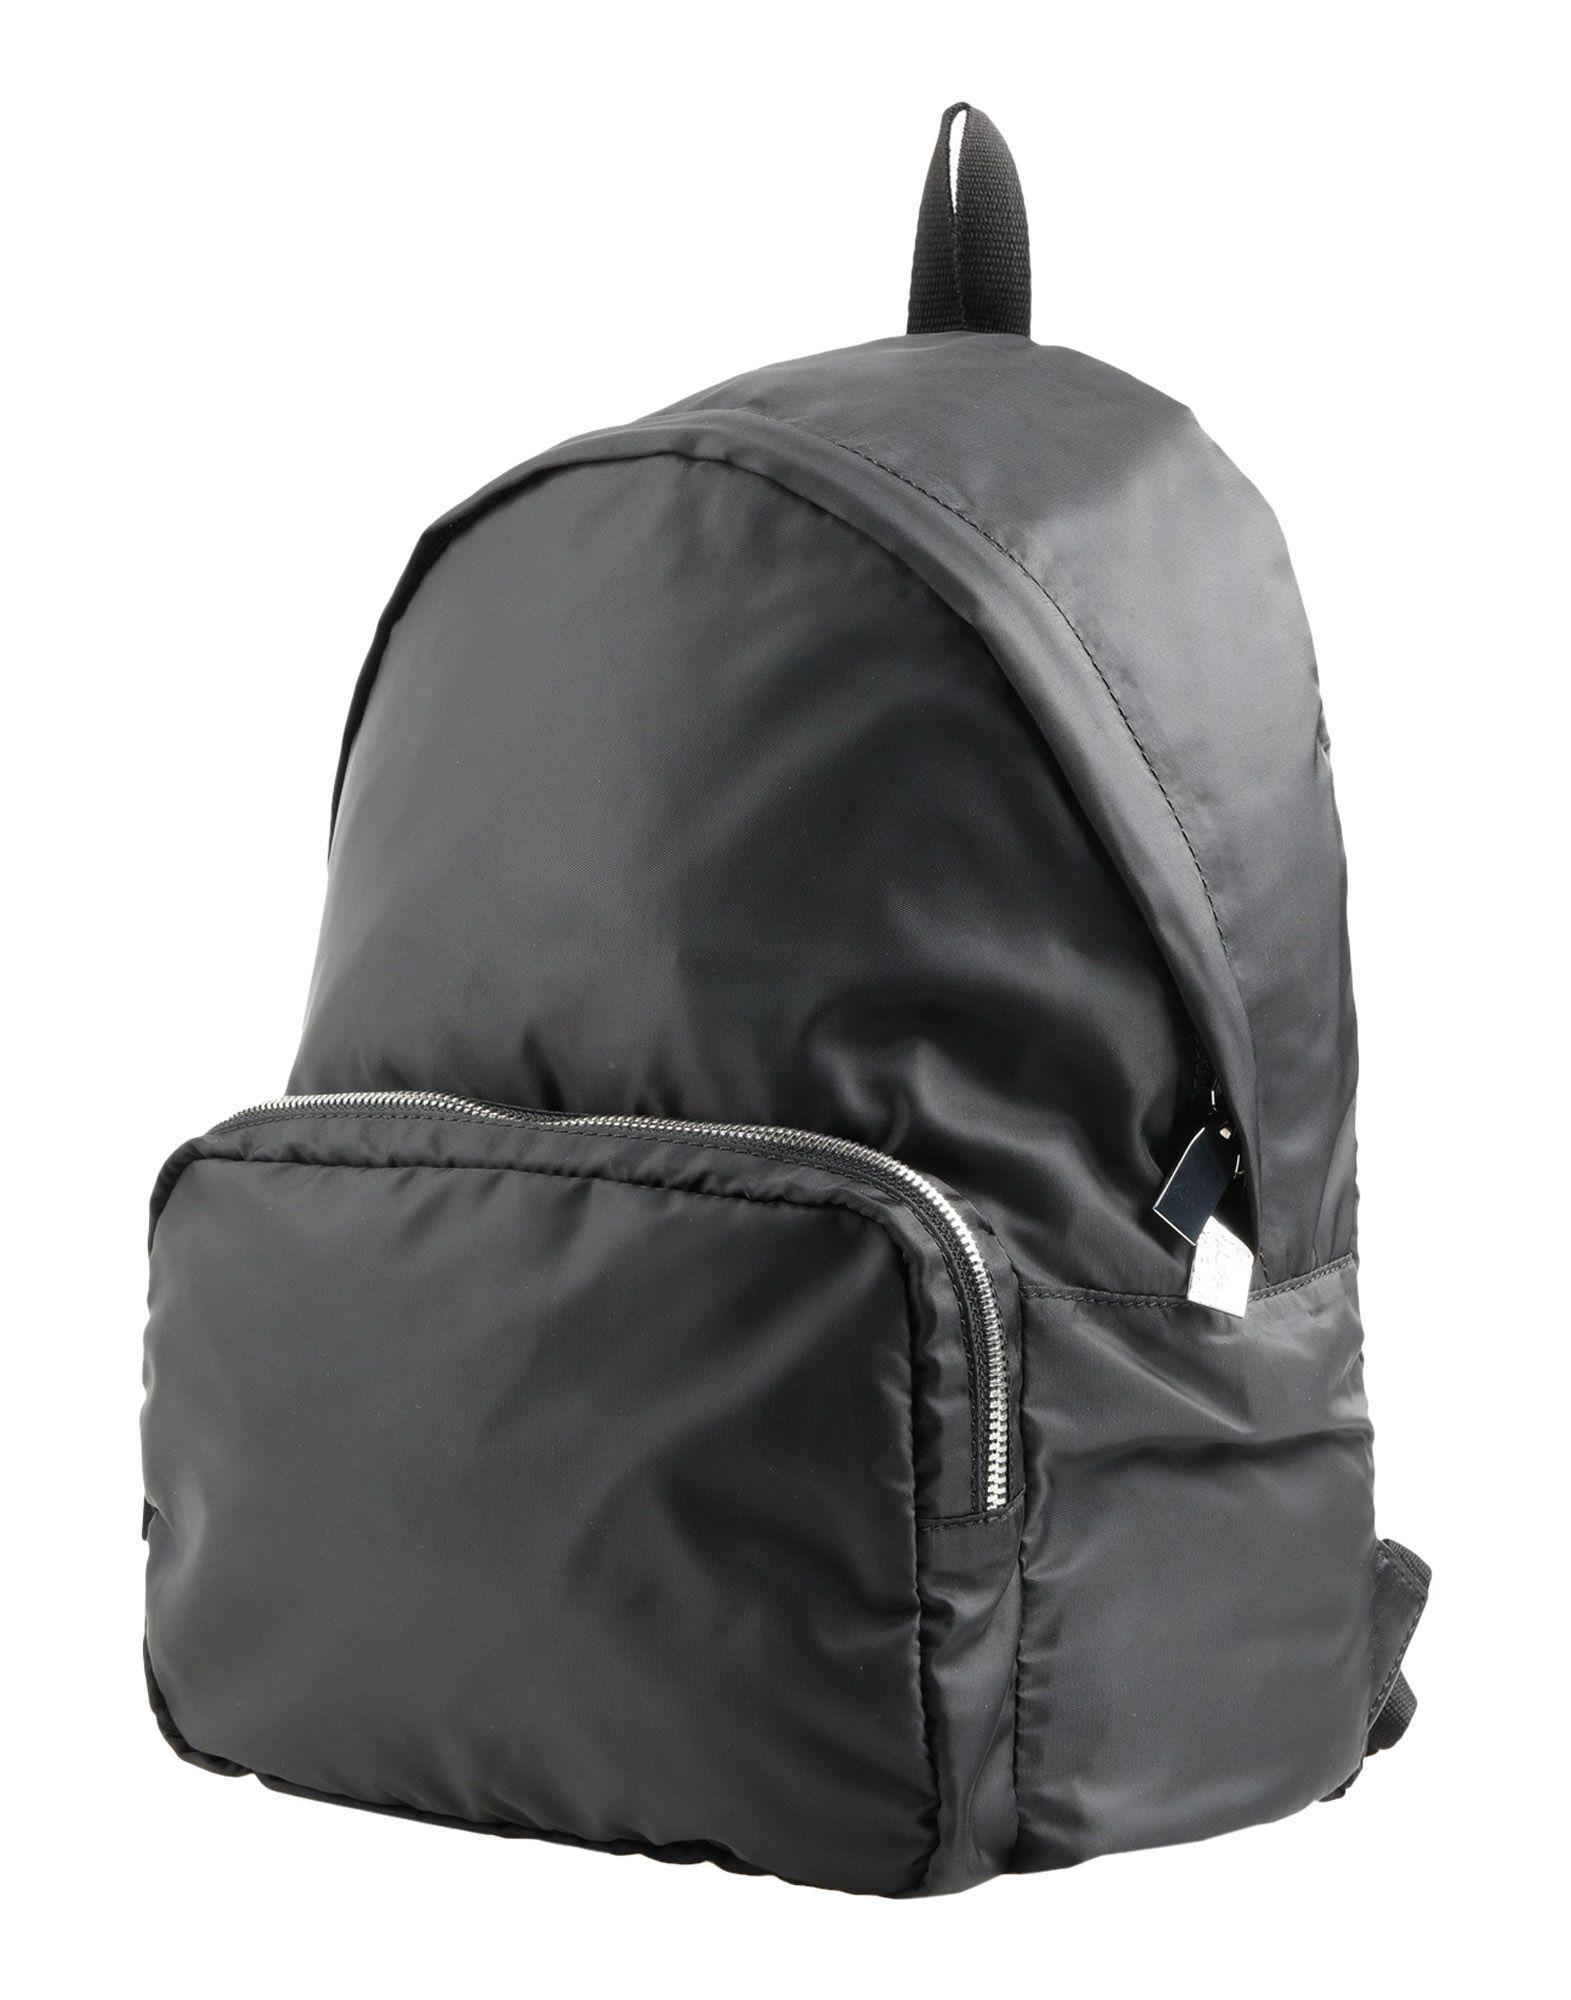 Pin on bagsdope backpack